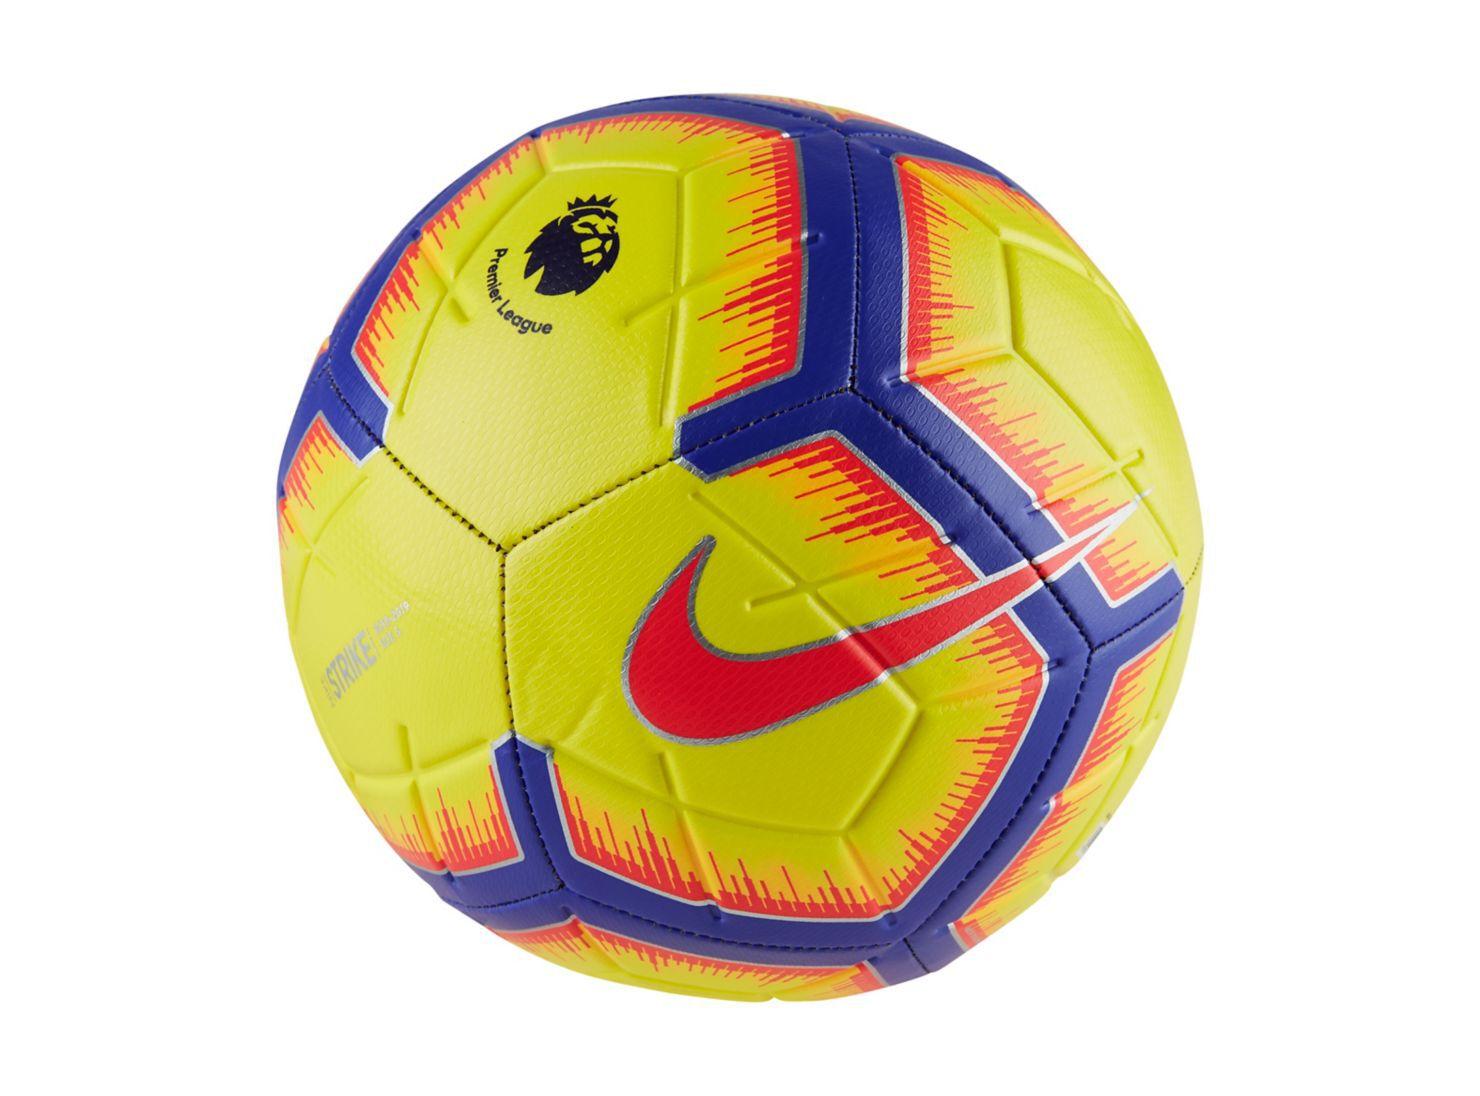 Images. Pelota de Fútbol Premier League Strike Nike ... 17f719df8fa7b